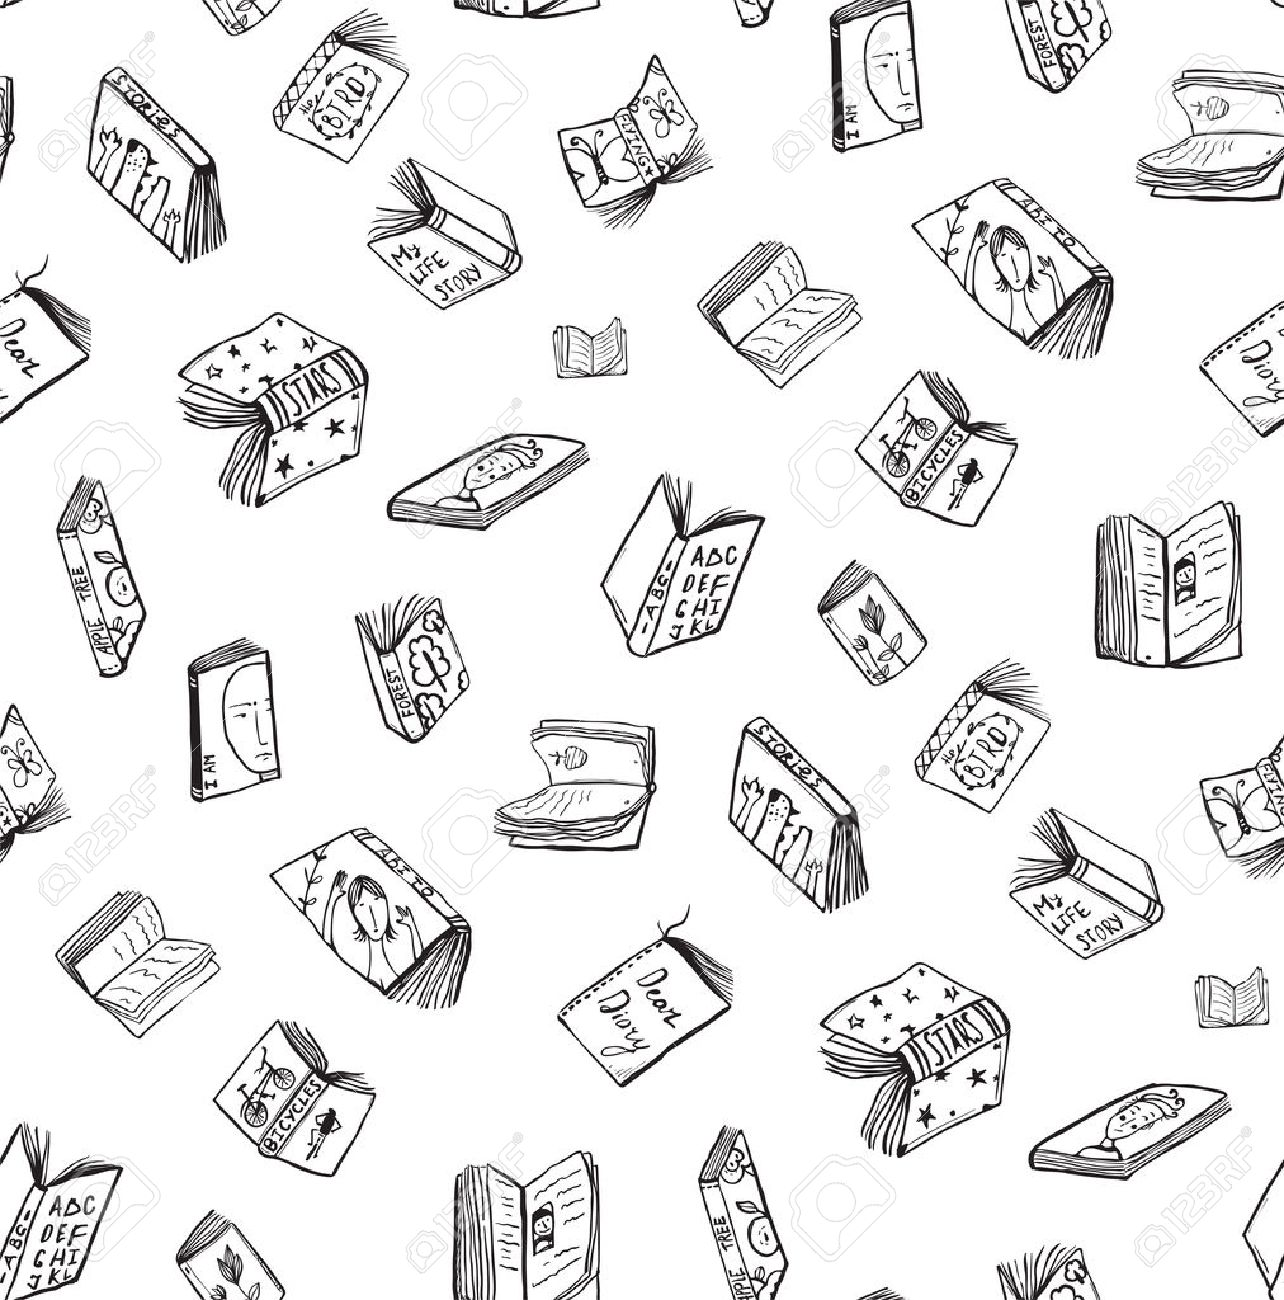 1284x1300 Open Books Drawing Seamless Pattern Background. Hand Drawn Black